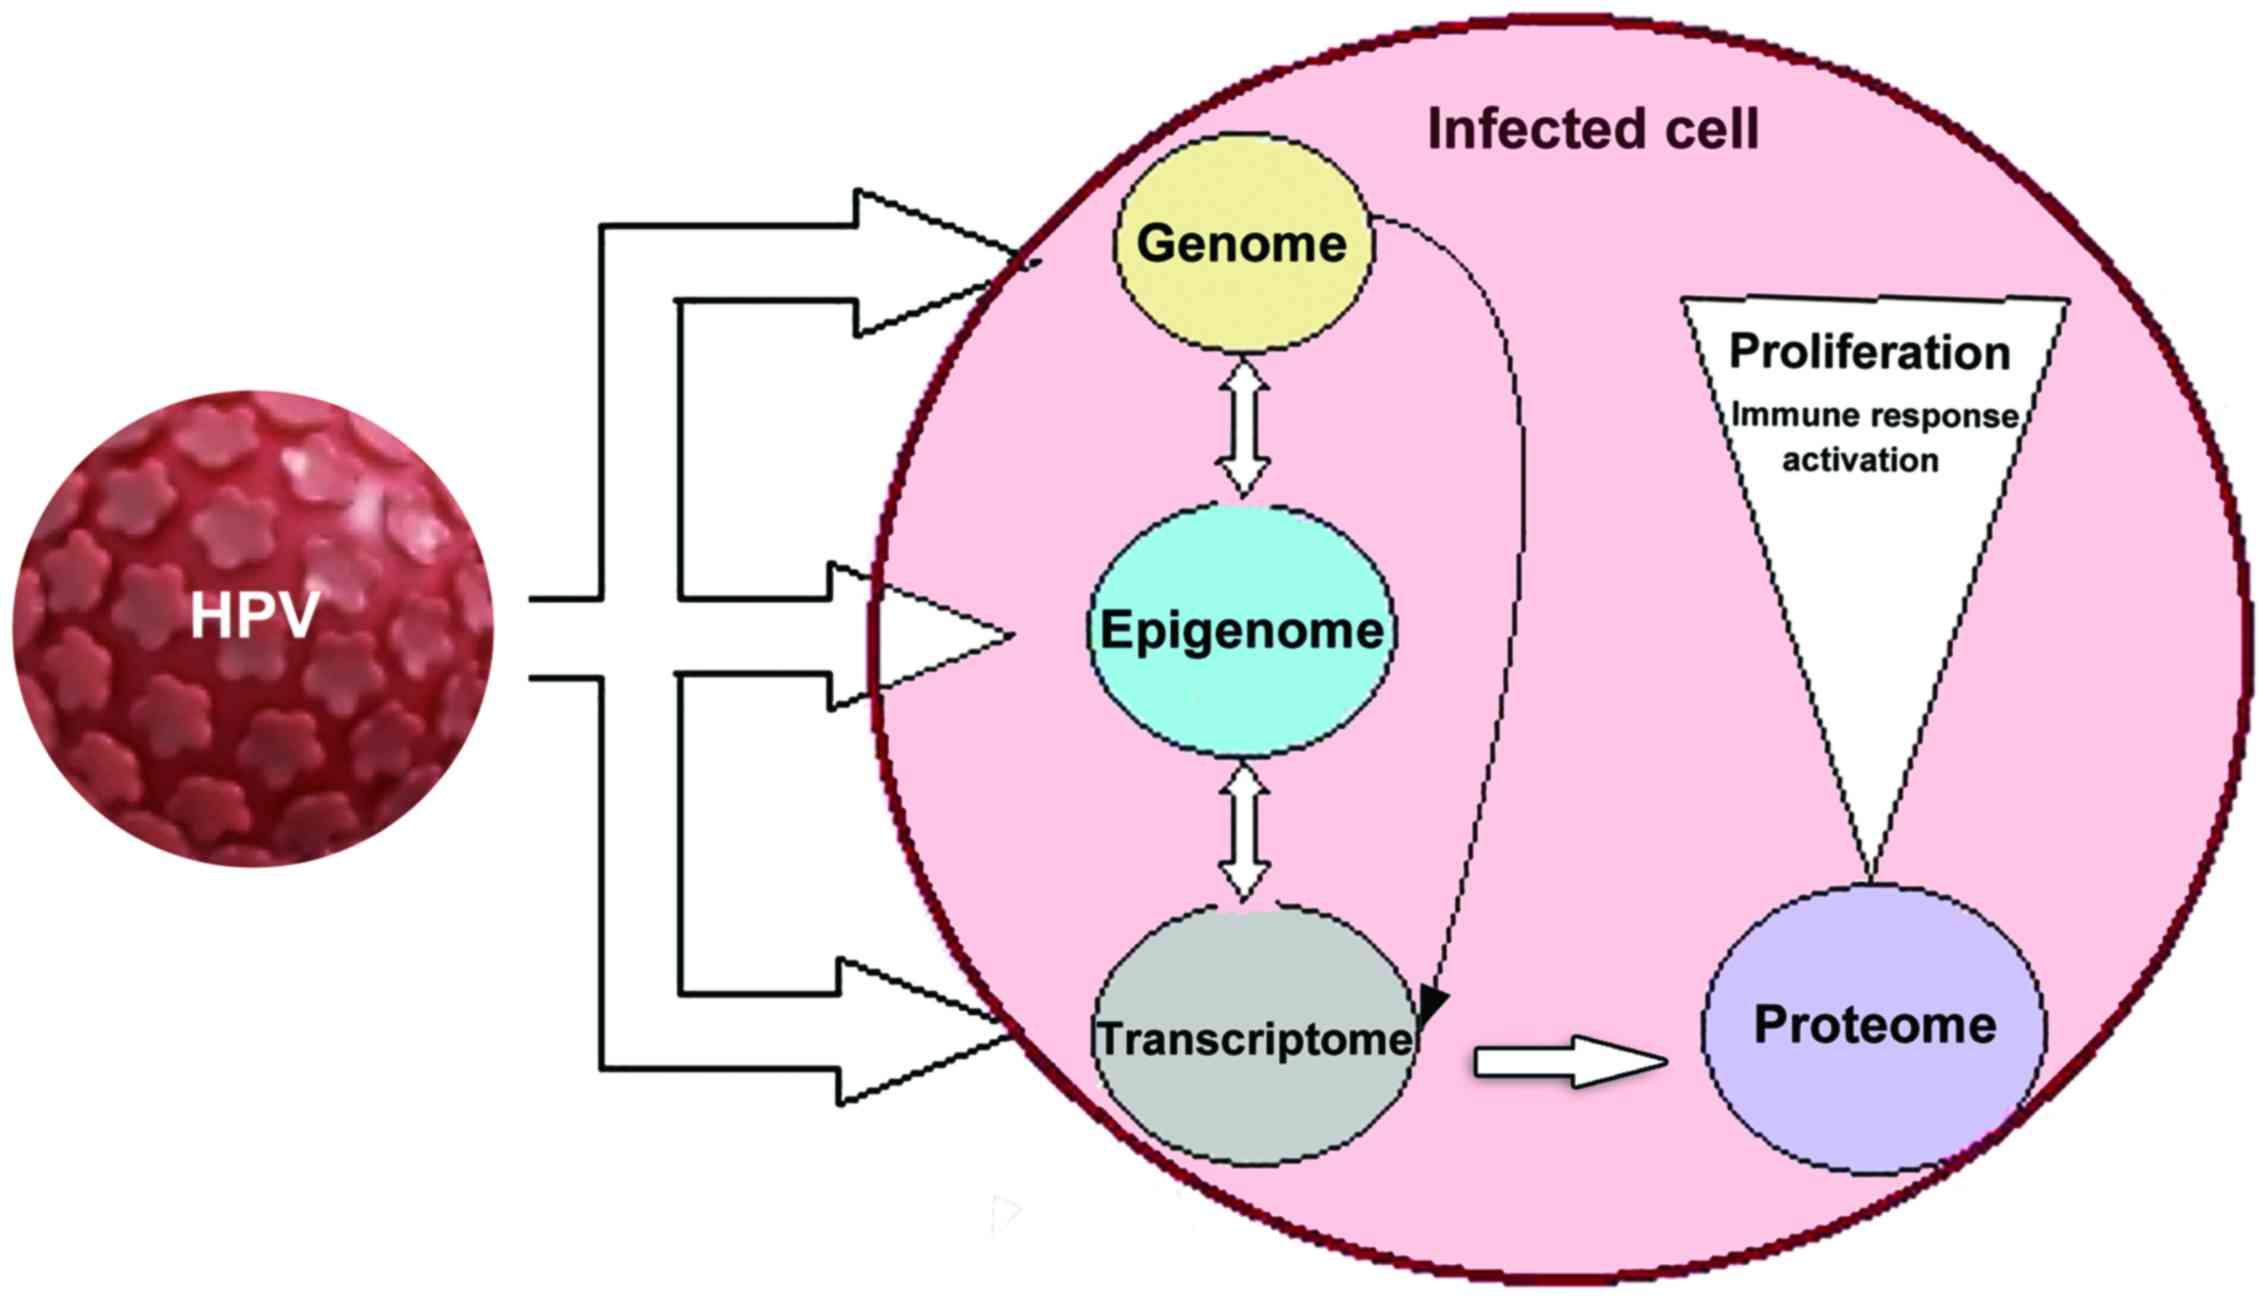 treatment for hpv precancerous cells